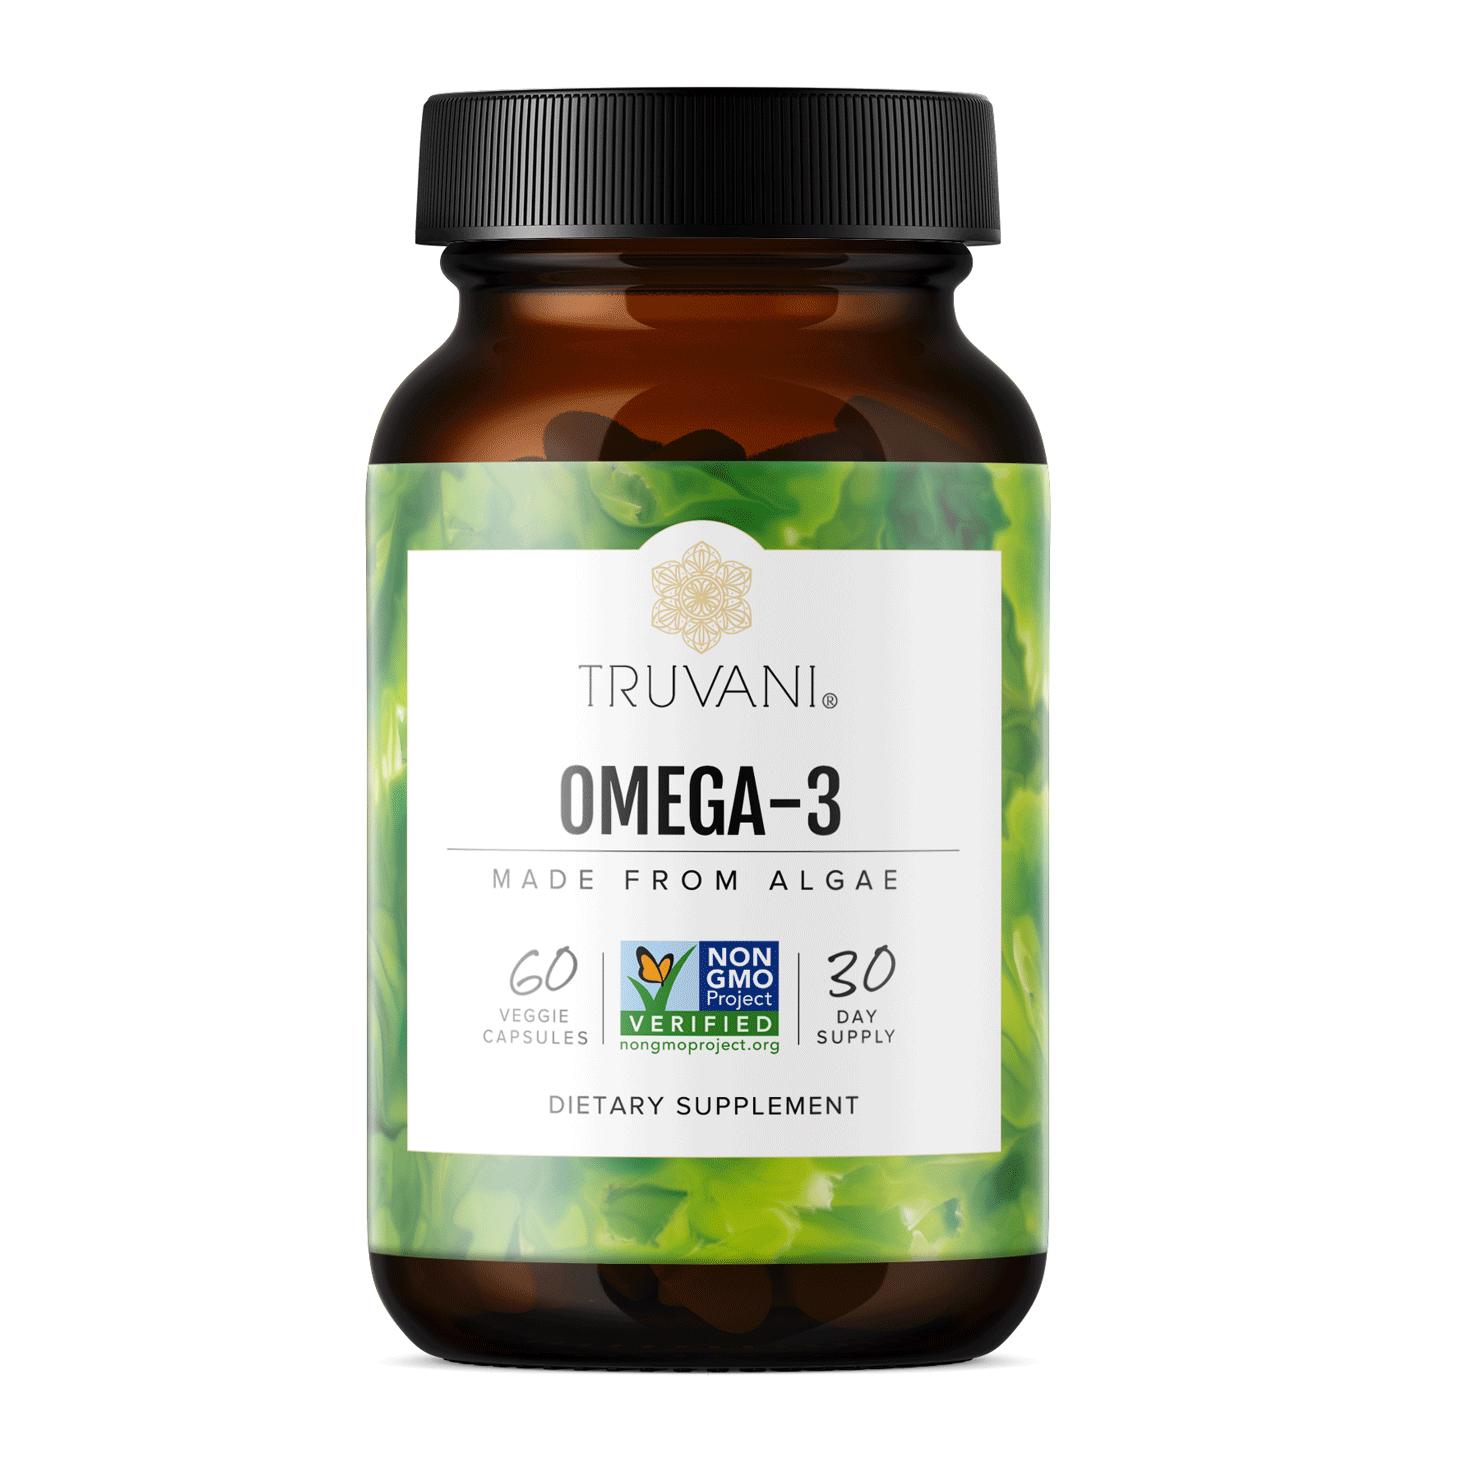 Omega-3 Capsules, Plant-based